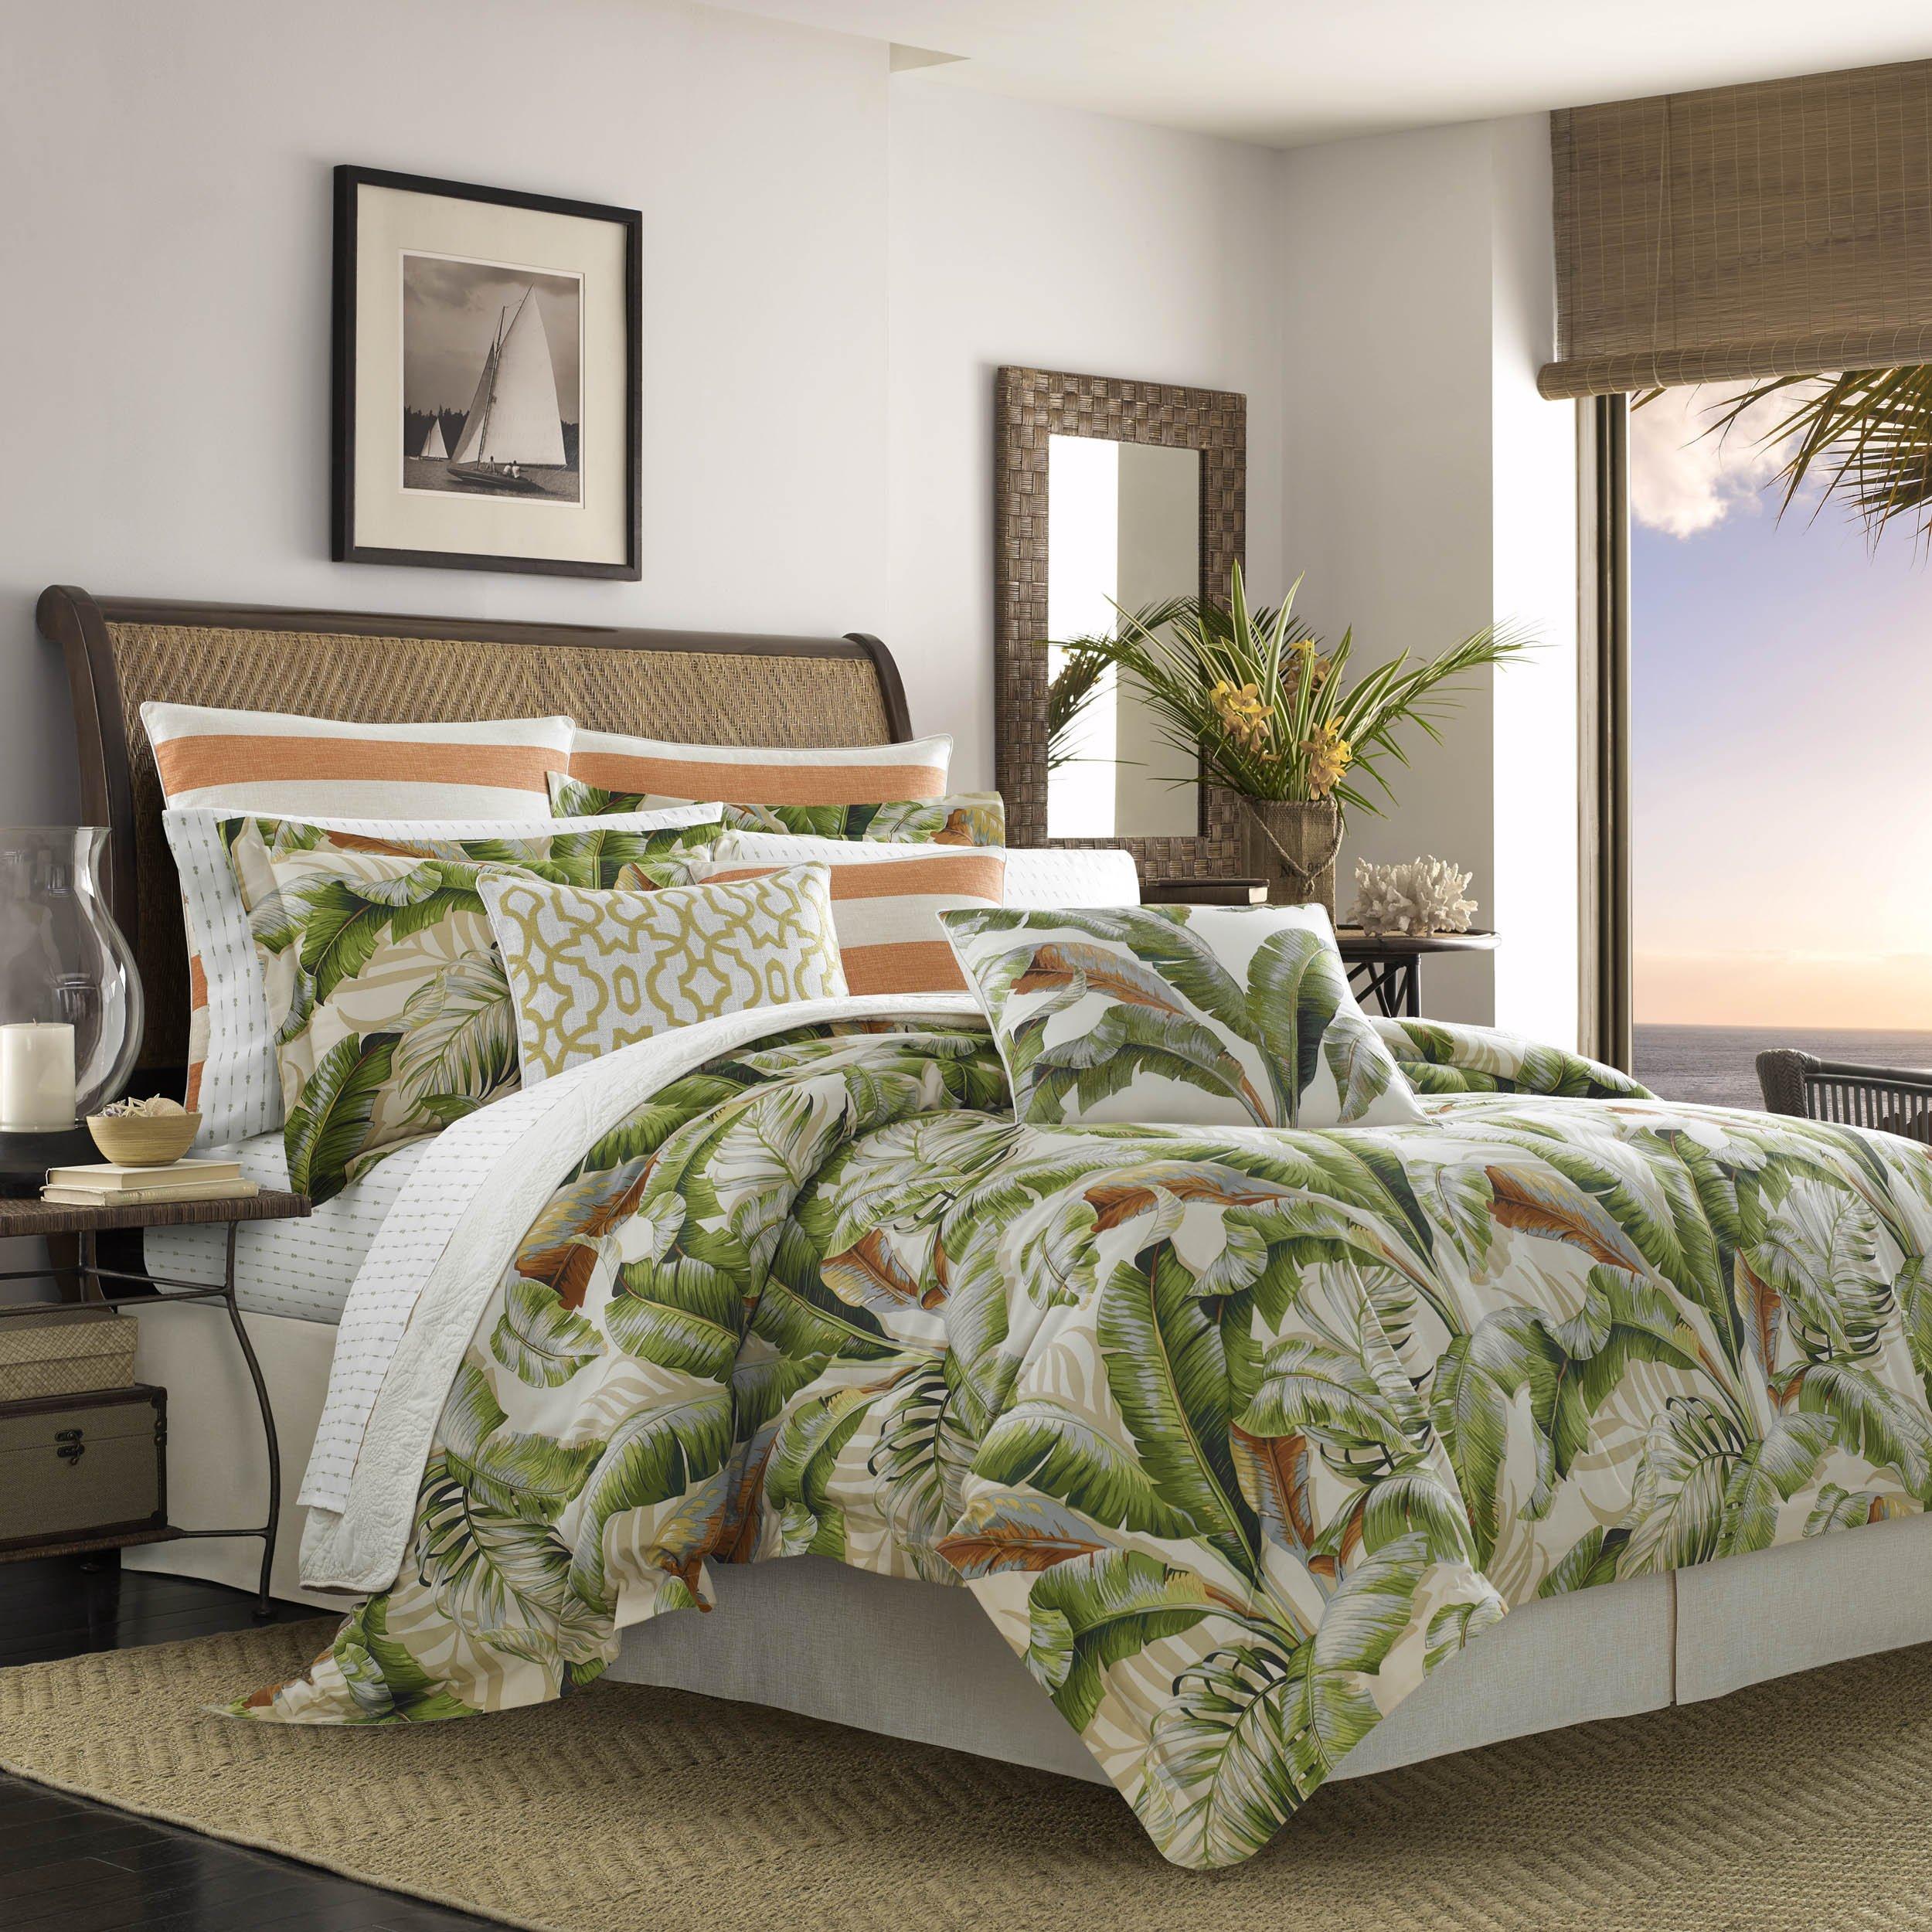 Tommy Bahama Palmiers Comforter Set, California King, Medium Green